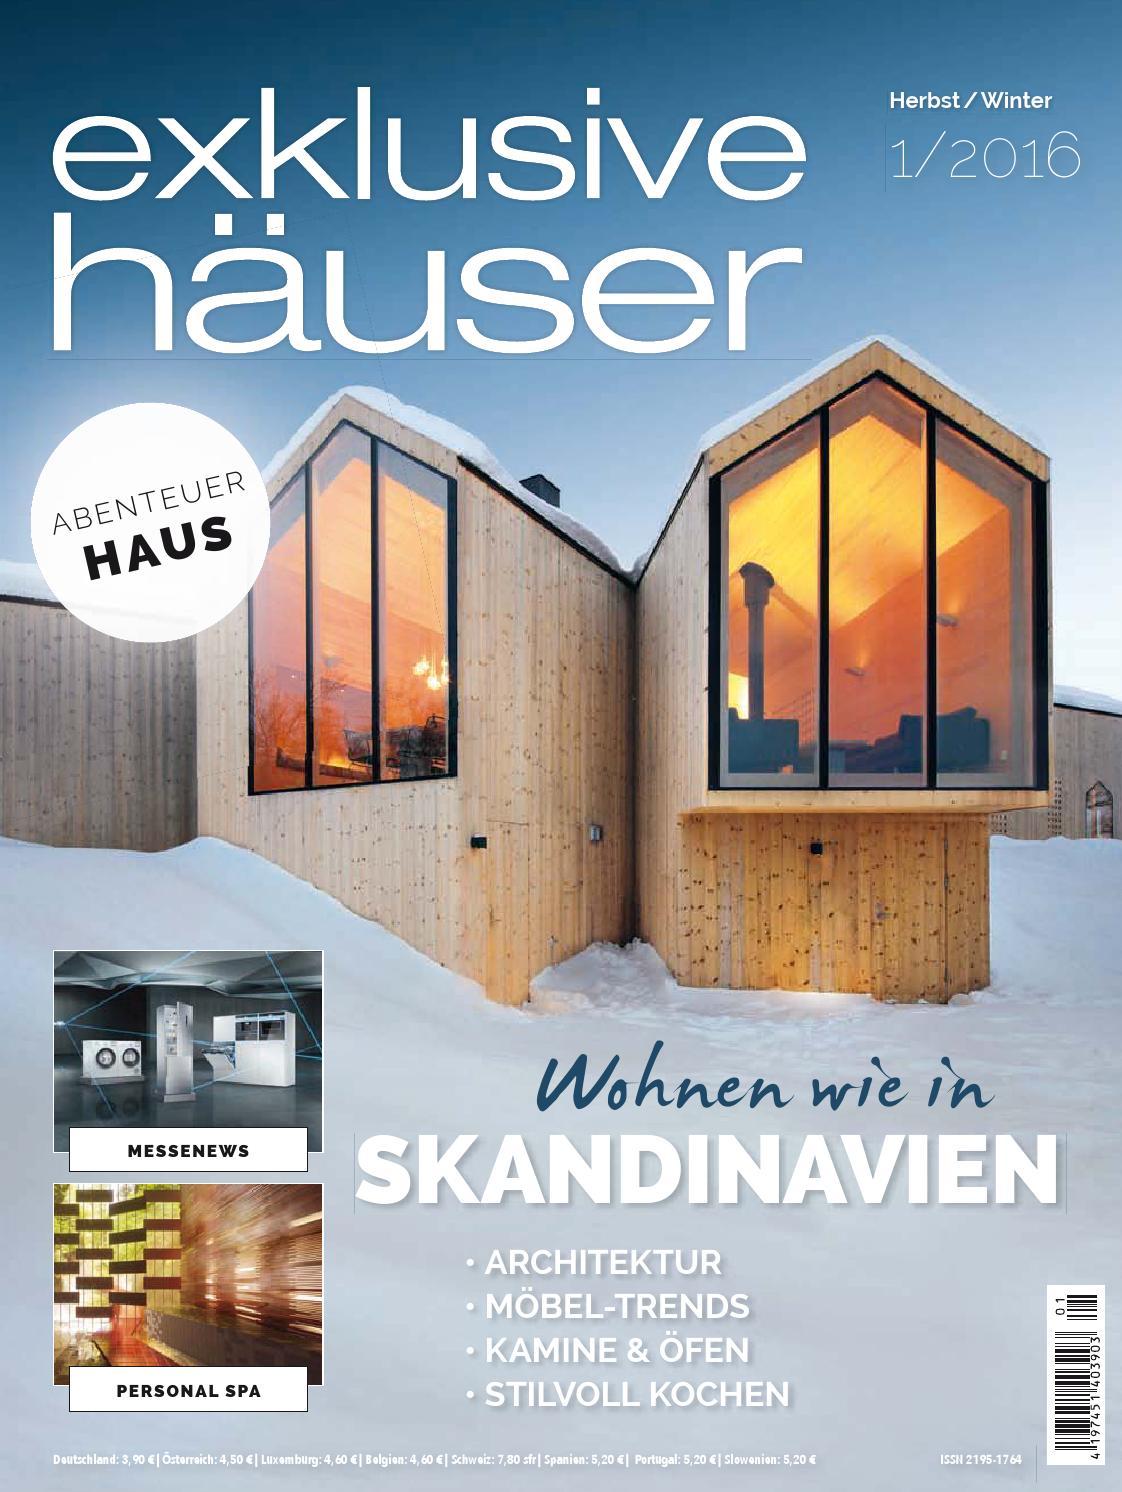 exklusive häuser 1/2016 by Family Home Verlag GmbH - issuu